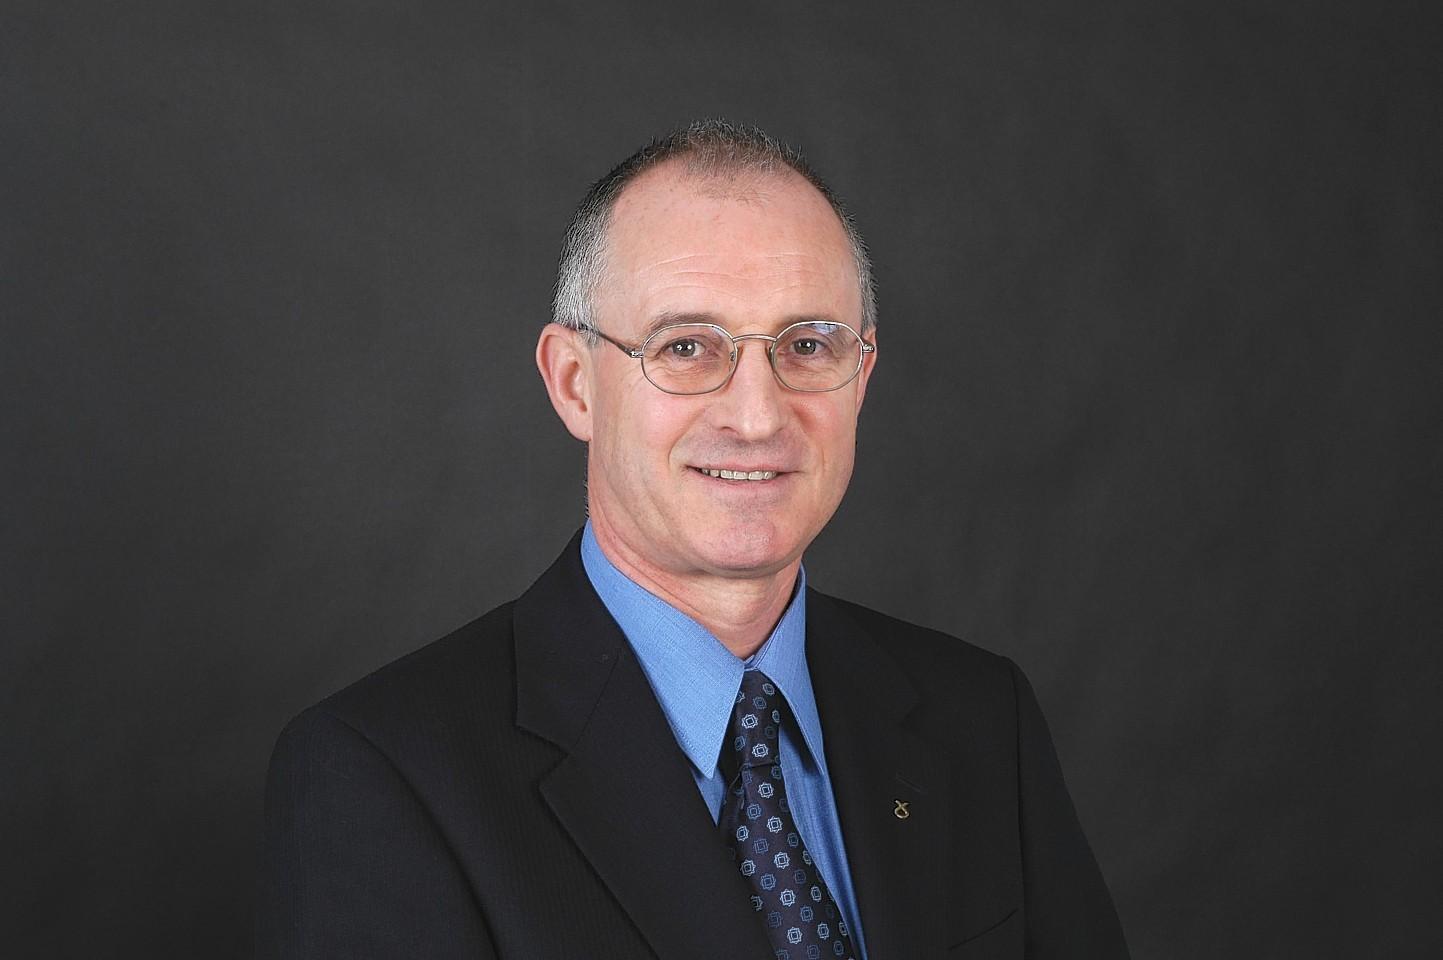 Highland MSP Dave Thompson